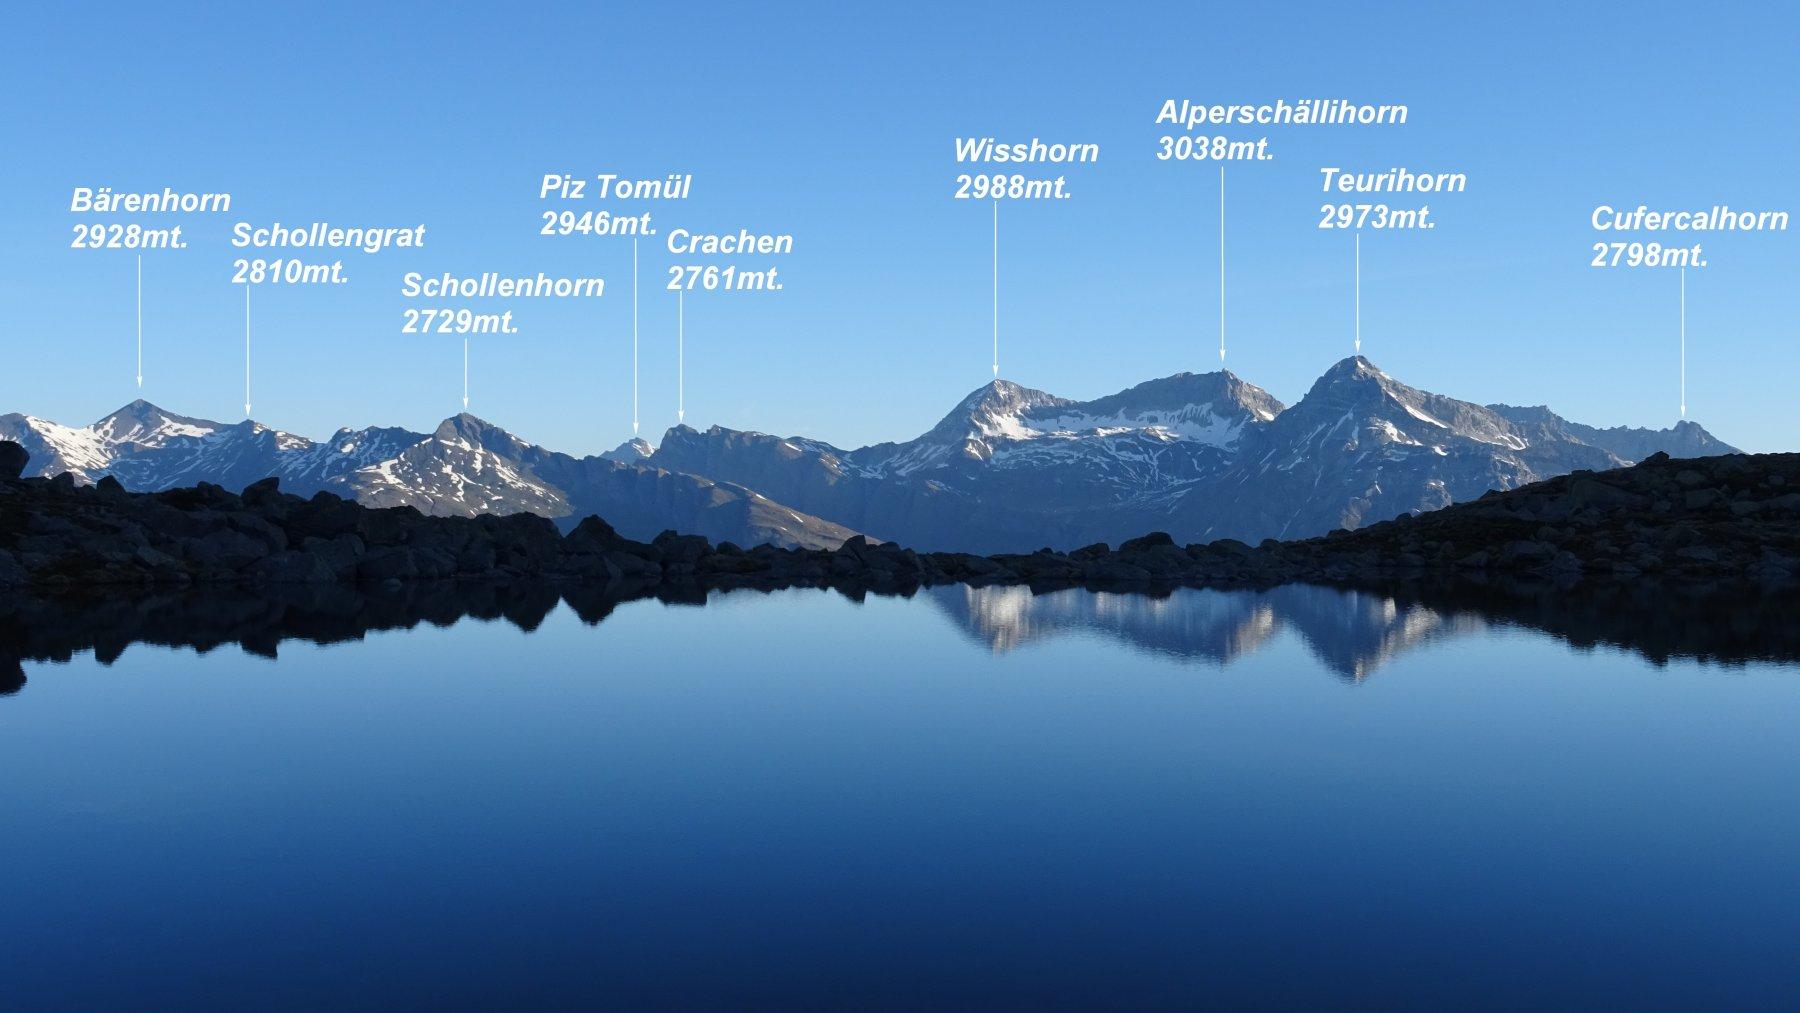 Bergseeli 2311mt.